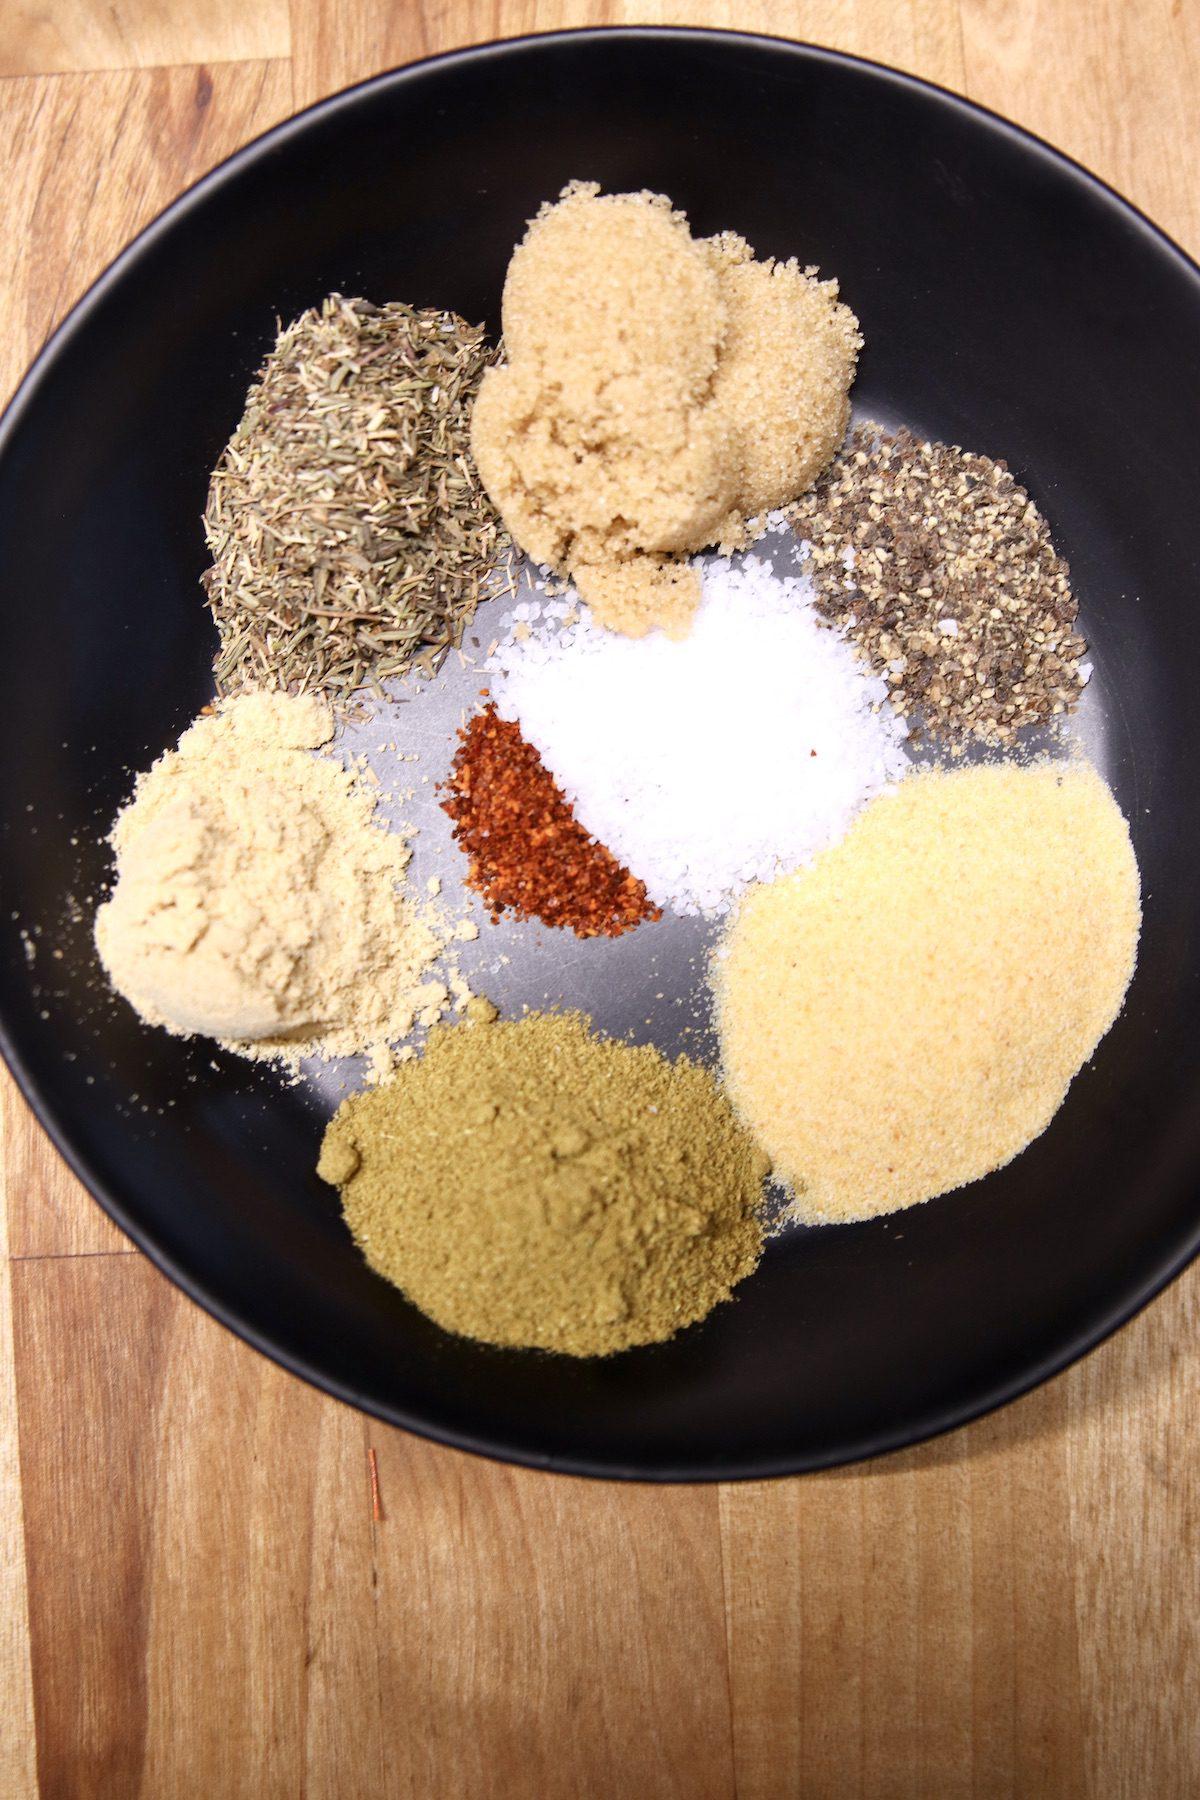 Spices for orange glaze